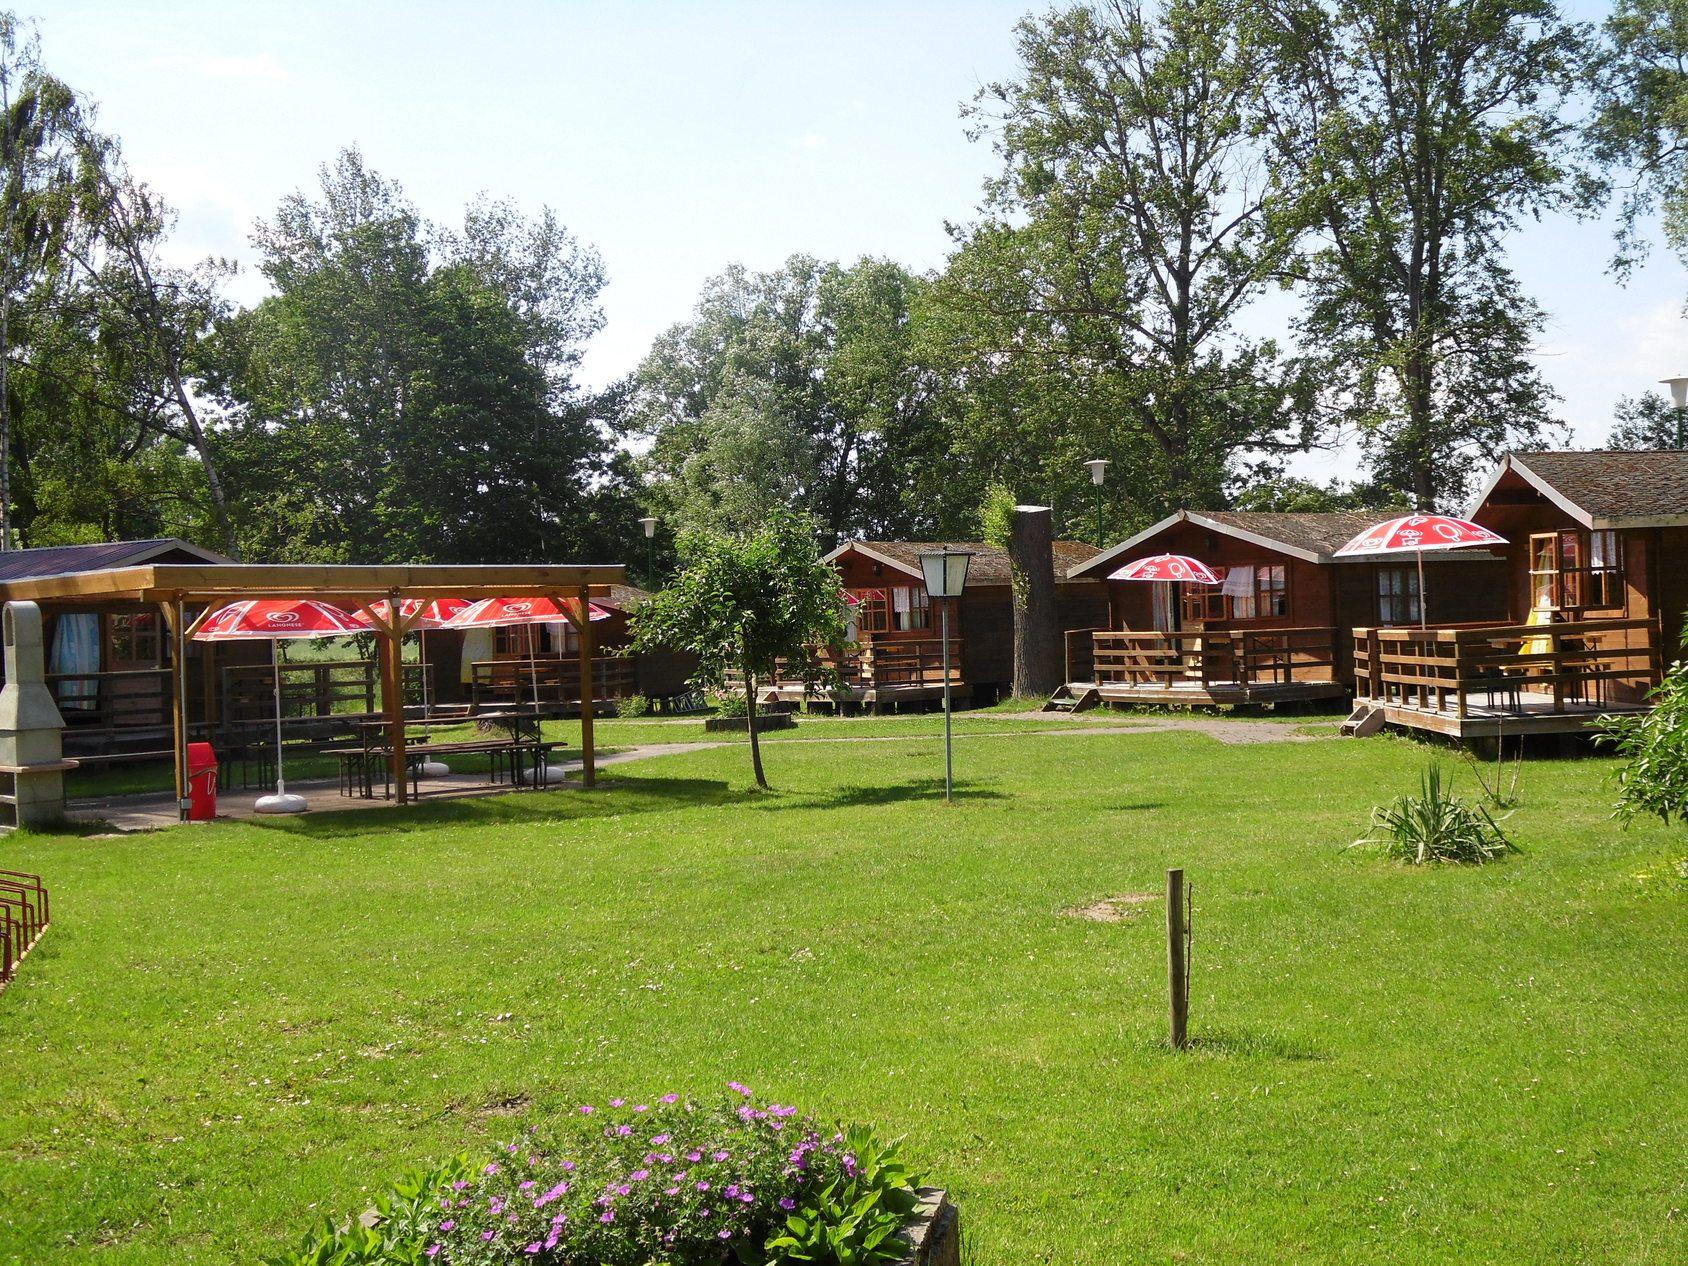 Duitsland-Bittkau-FamilyCampKellerwiehl-ExtraLarge Campings Duitsland